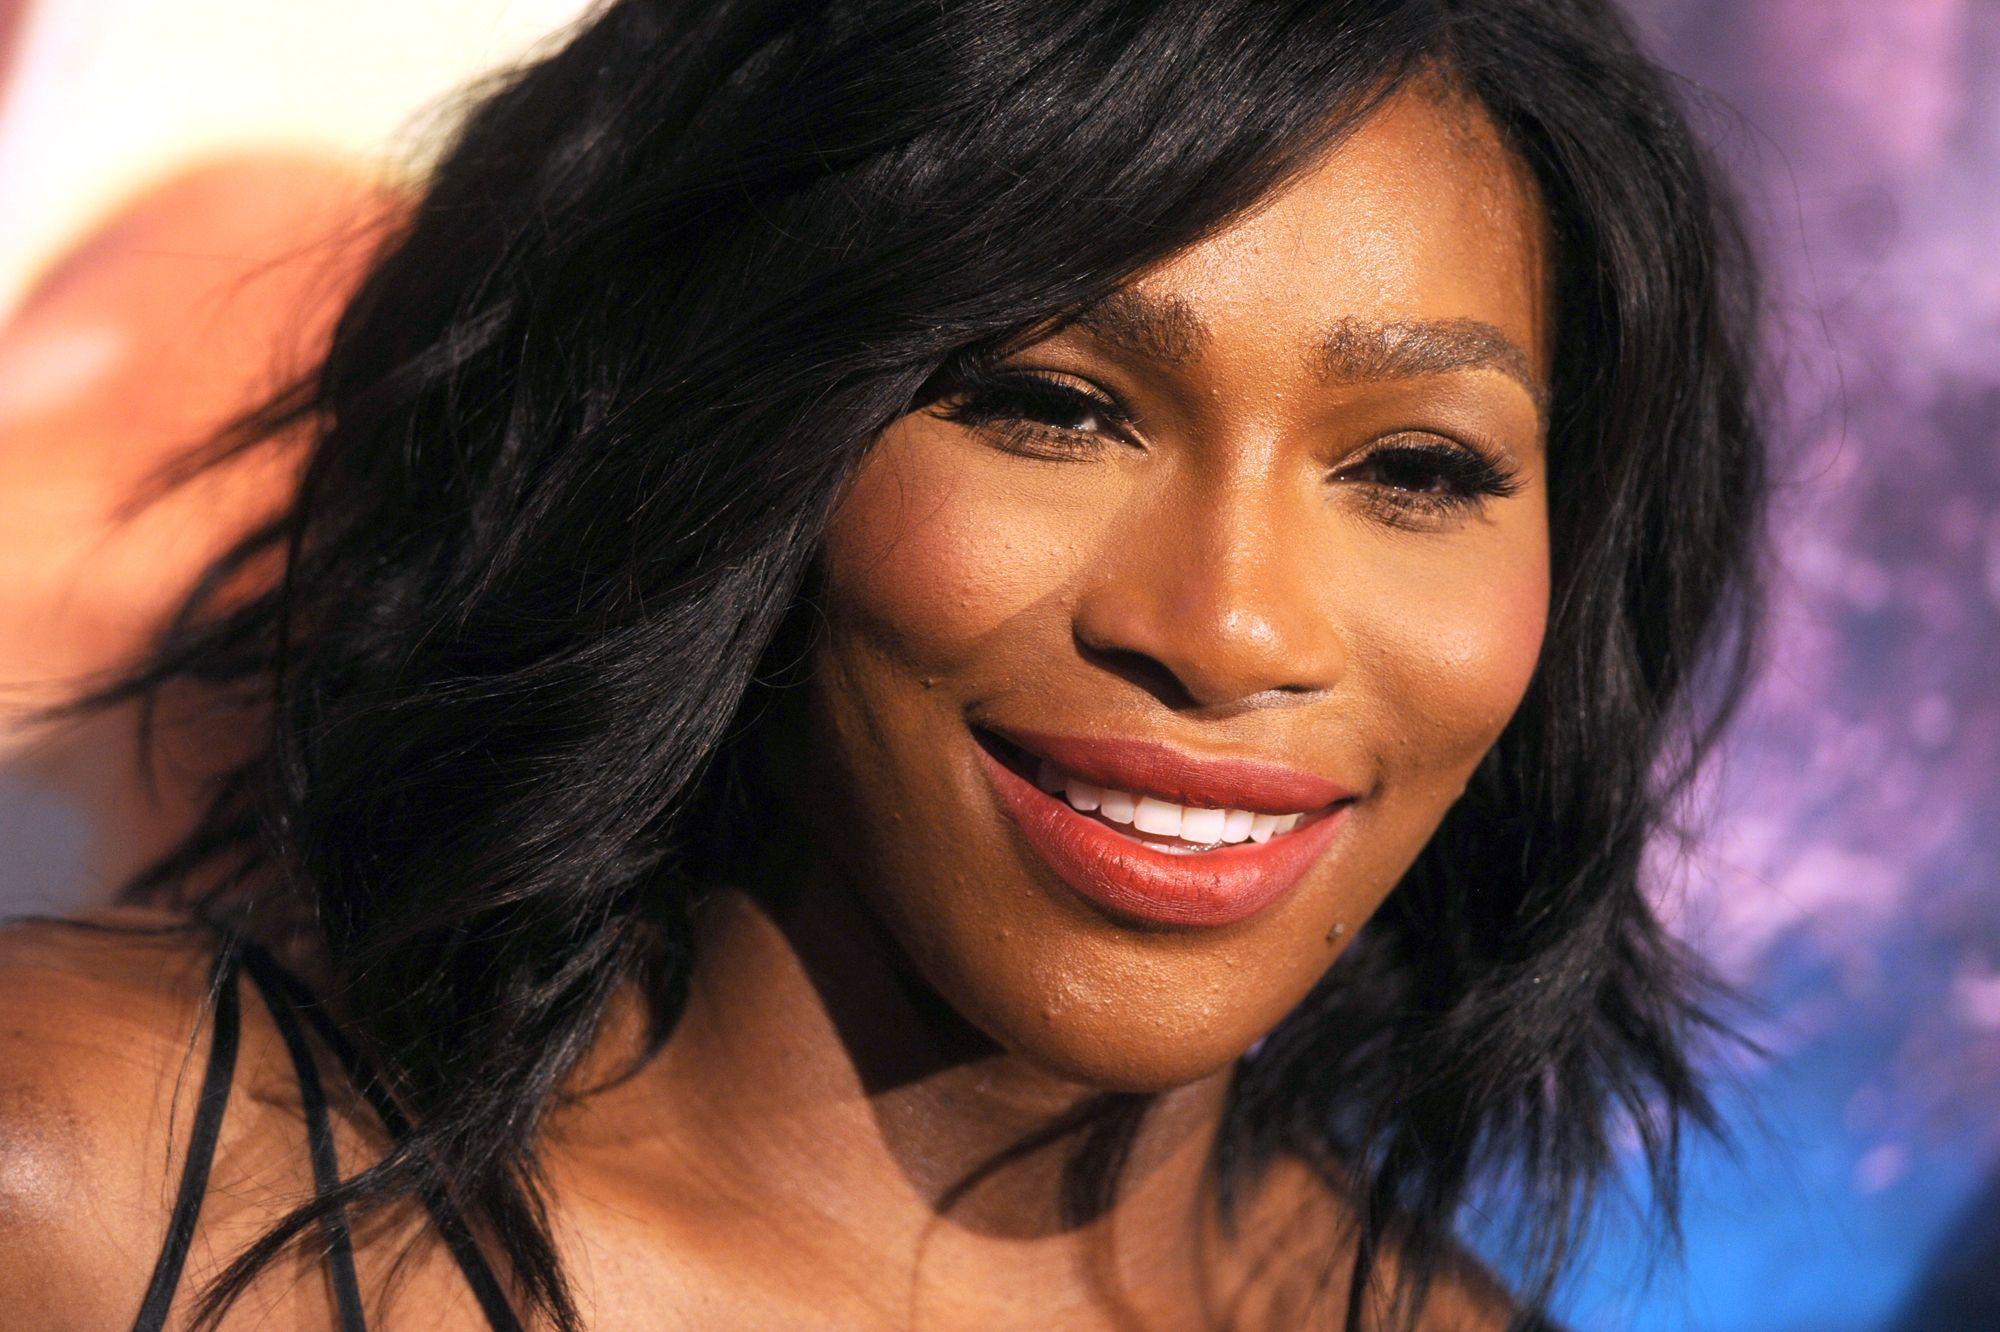 La reine du tennis La star sexy de la semaine : Serena Williams